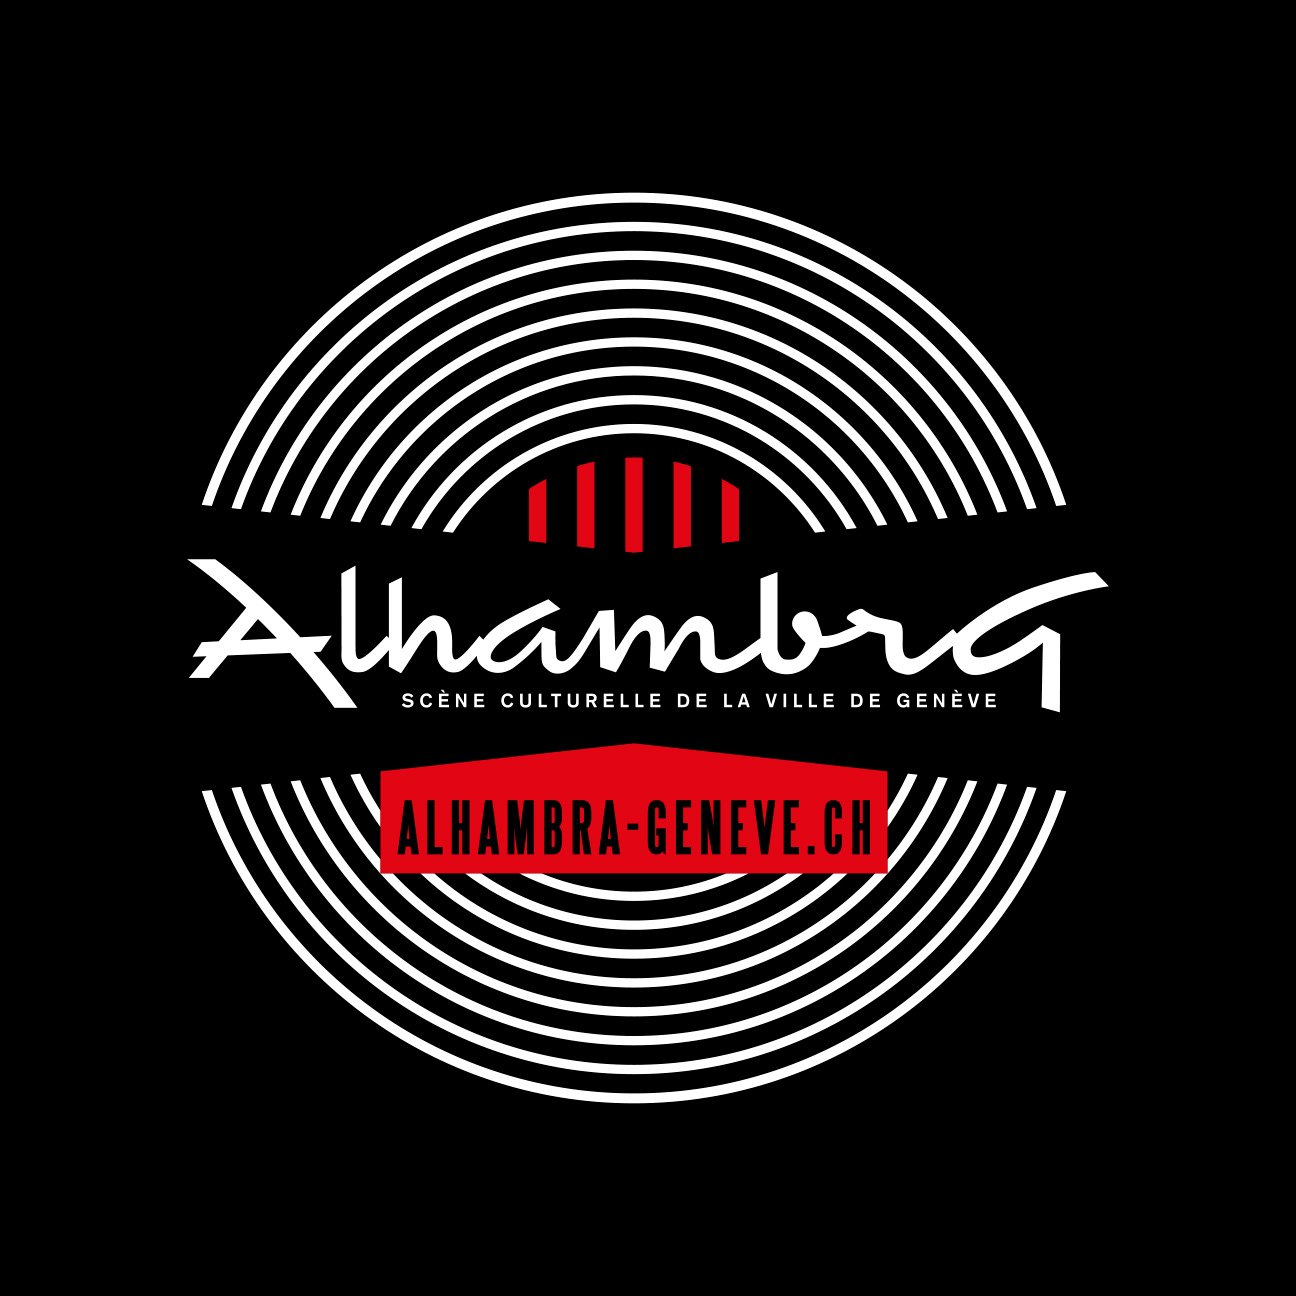 Fabien_cuffel_Graphisme_Alhambra_logo_identity